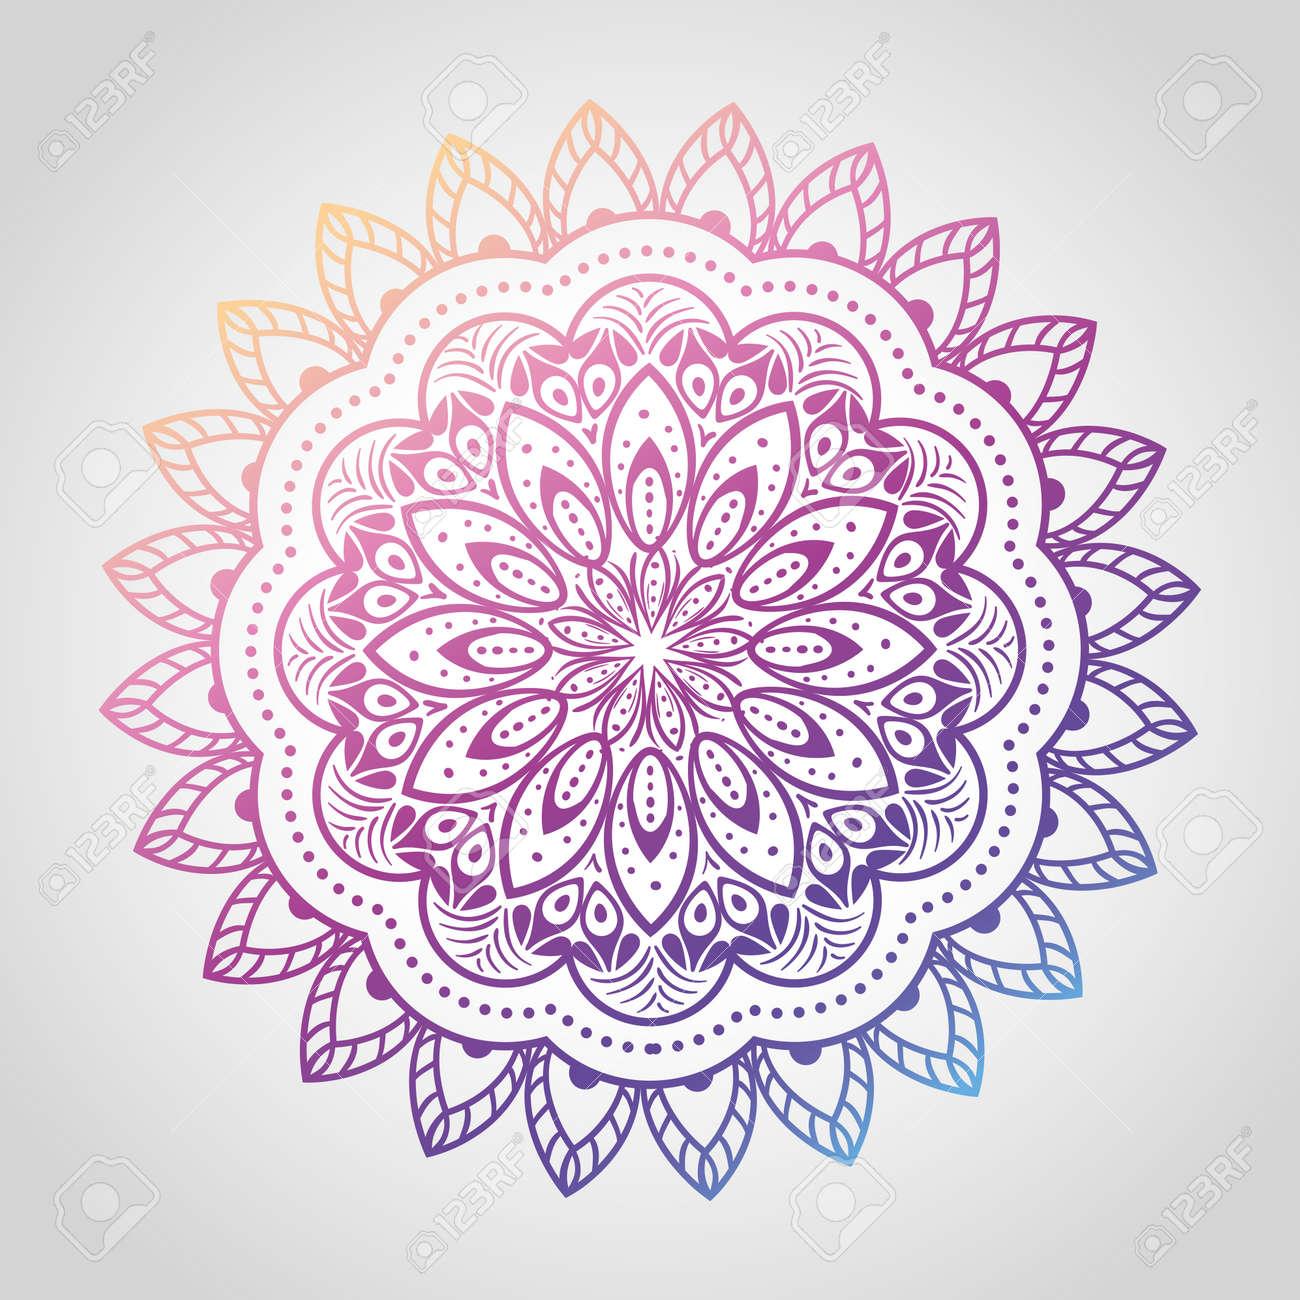 floral mandala of differents colors, vintage luxury mandala, ornamental decoration vector illustration design - 153933850